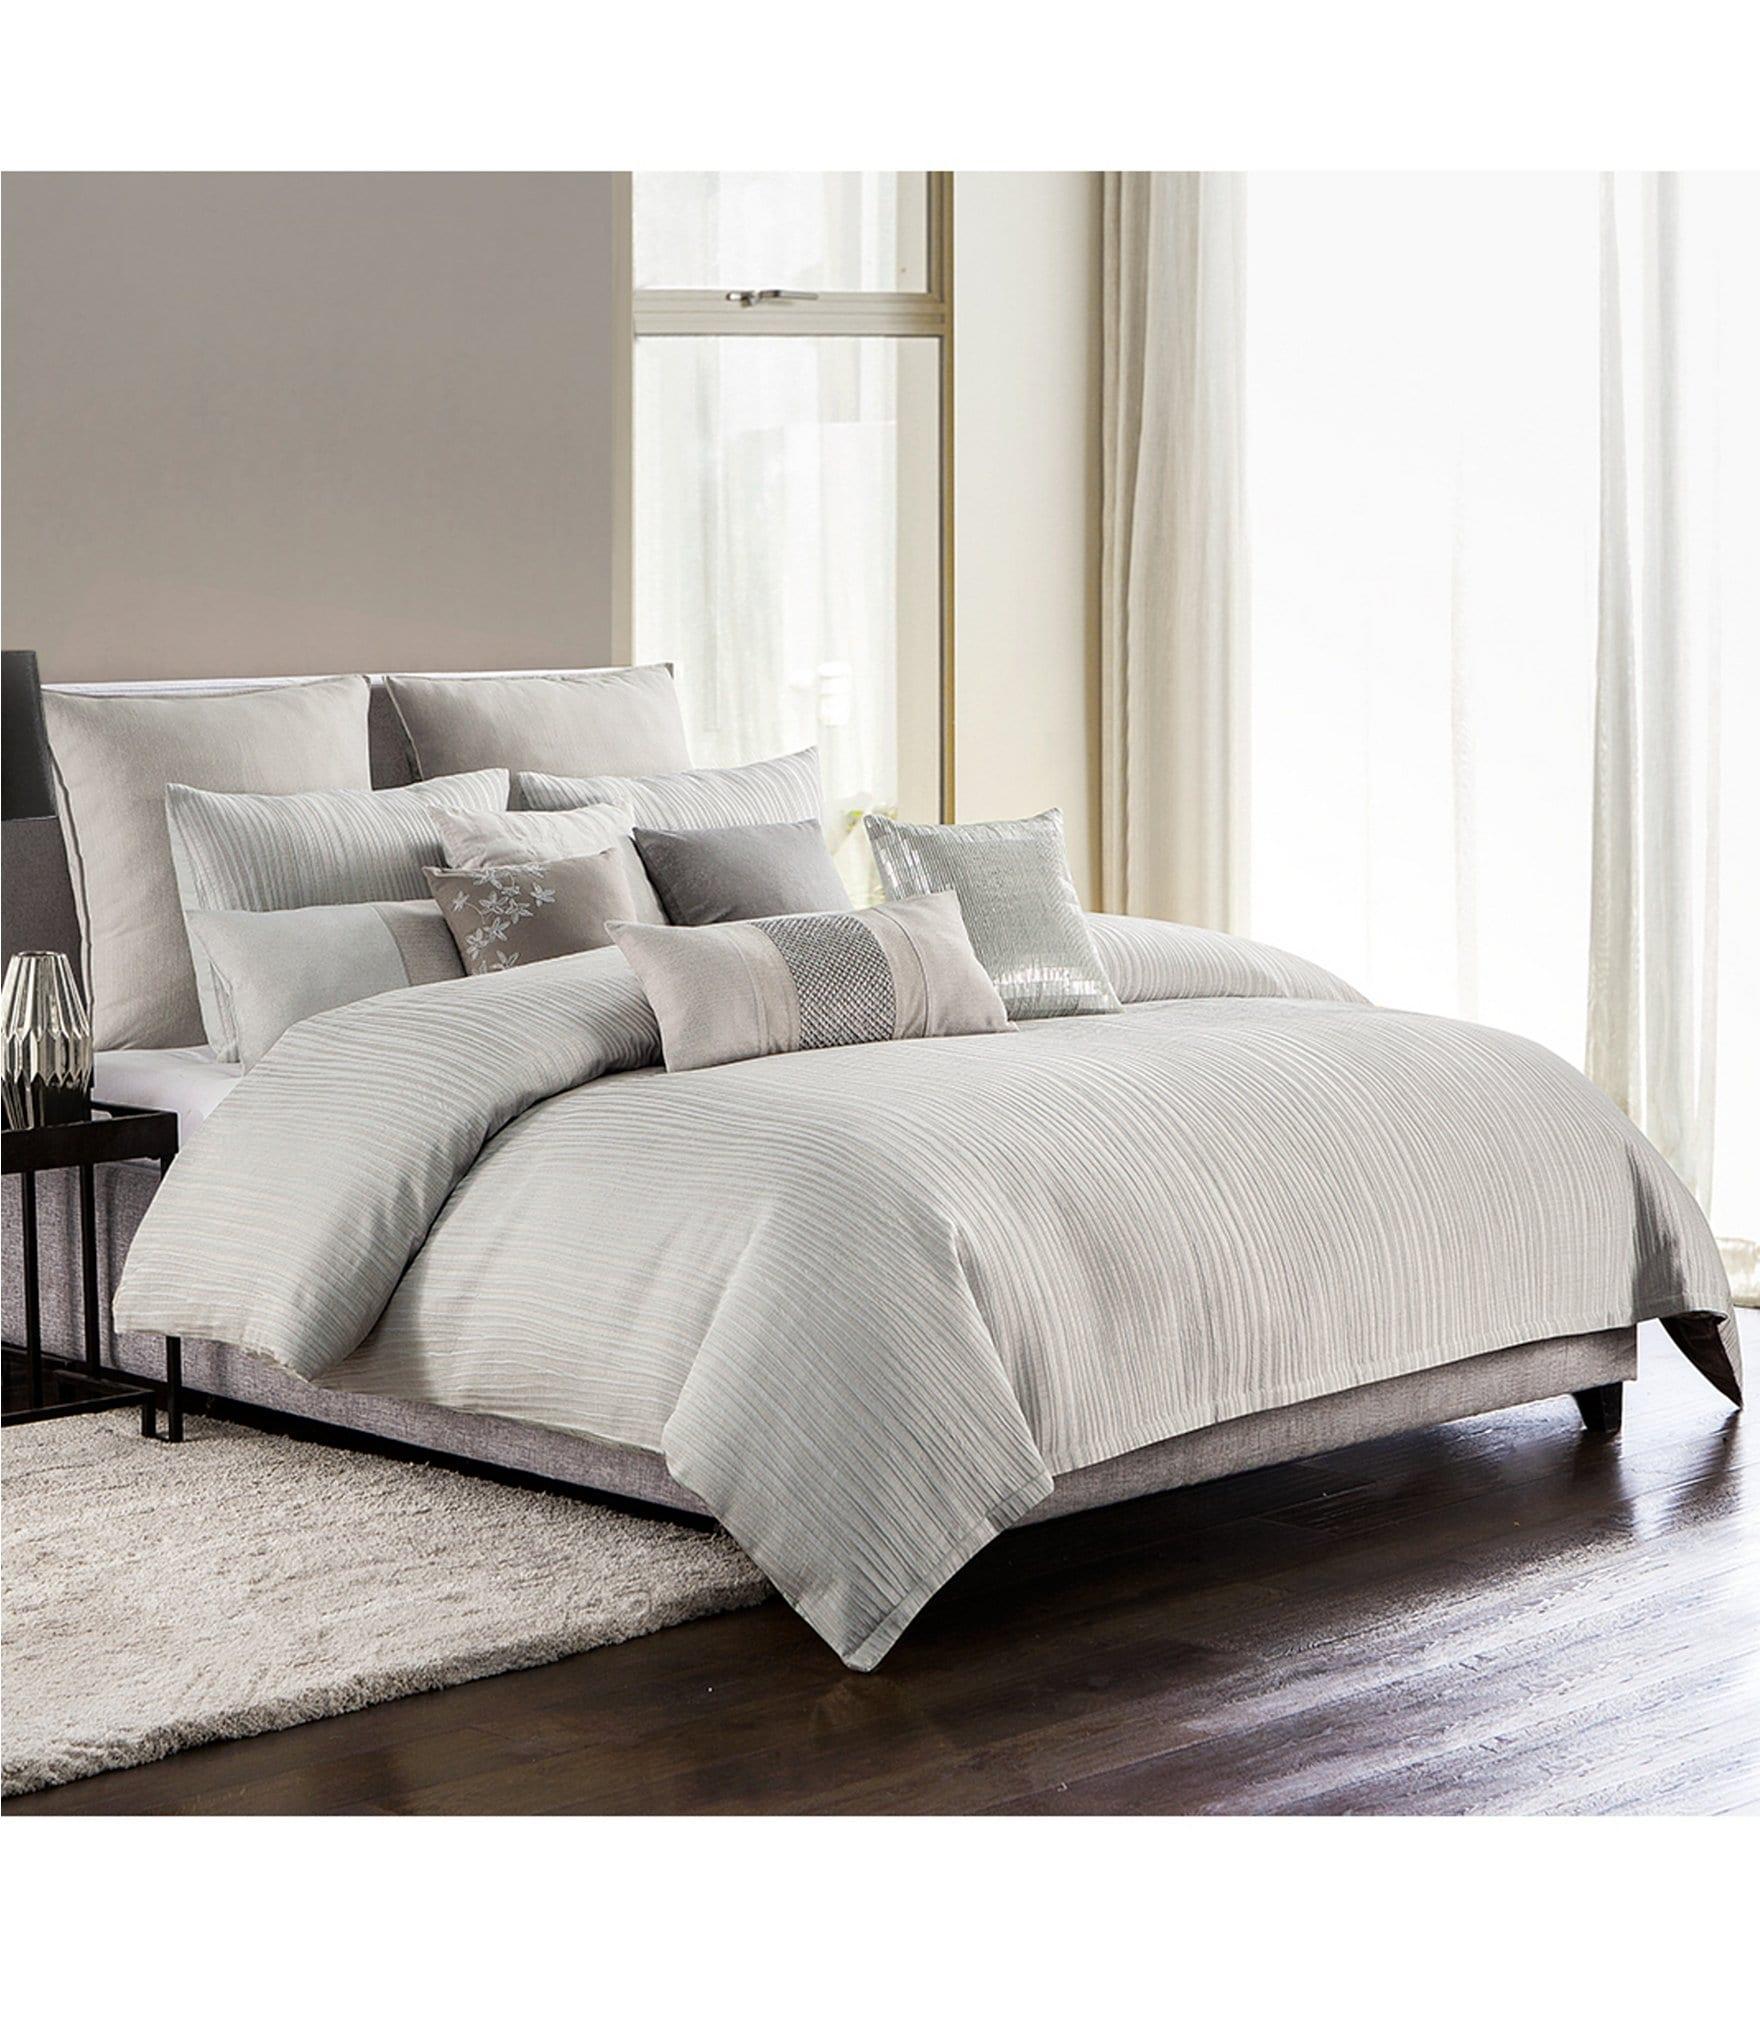 Highline Bedding Co Hylton Comforter Mini Set Dillards